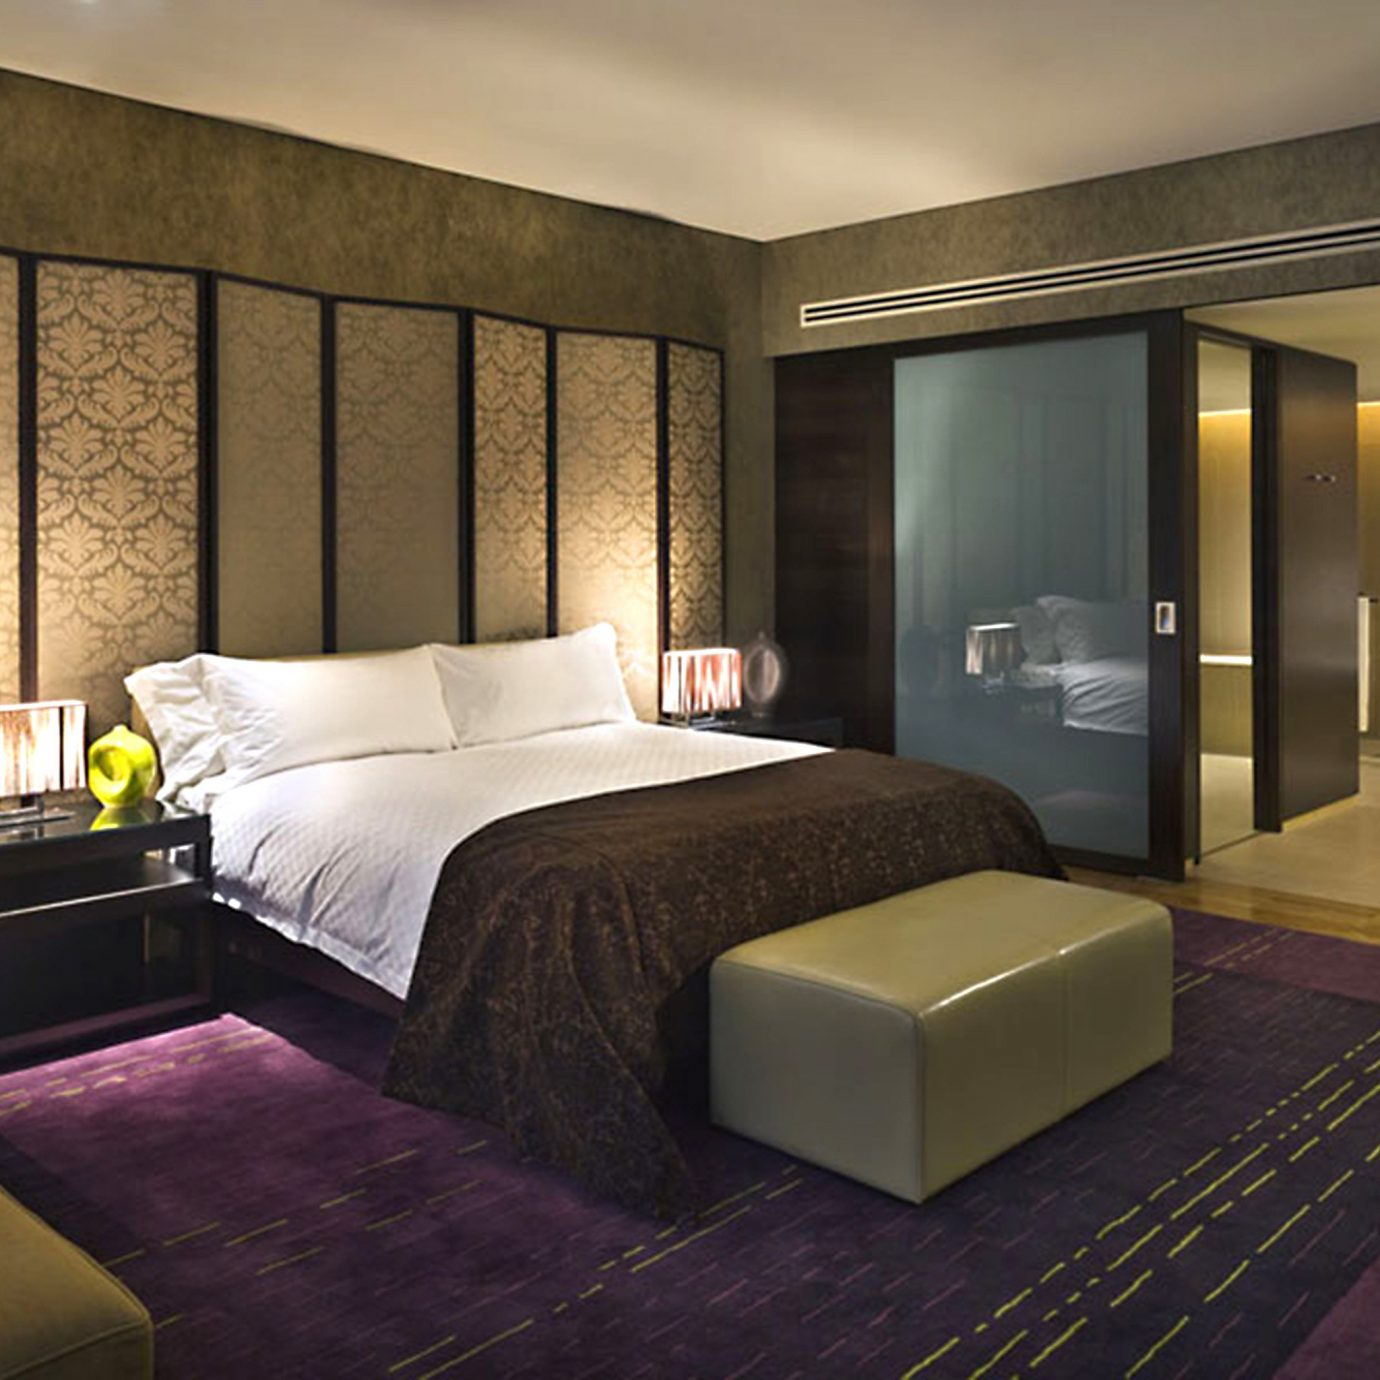 Bath Bedroom Luxury Modern Suite sofa property living room condominium